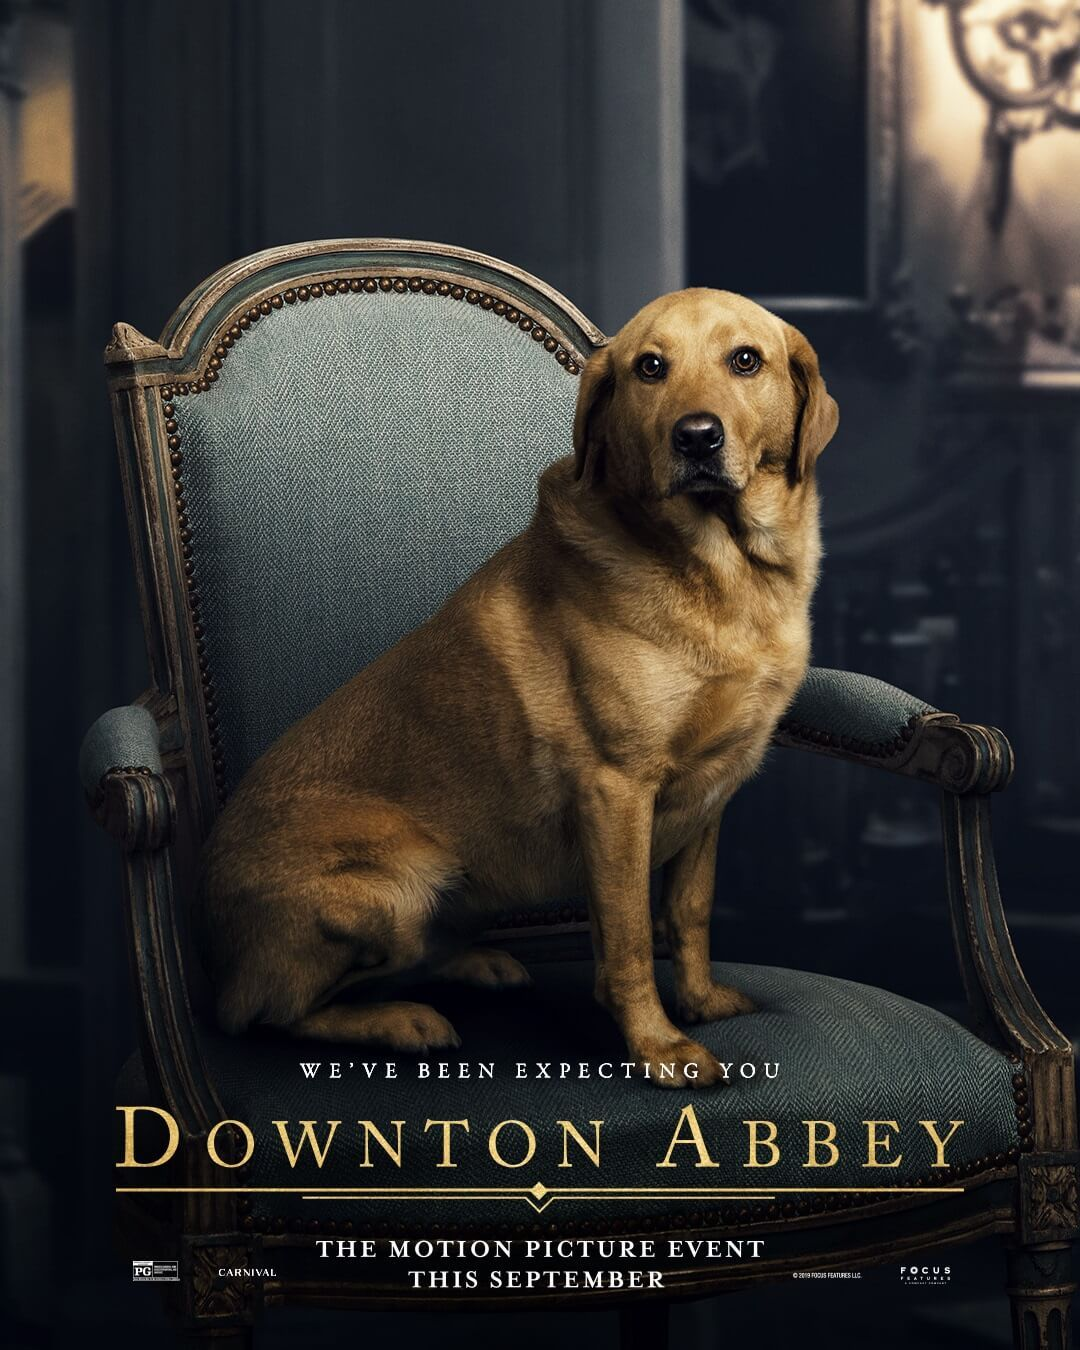 Downton abbey celebrates international dog day with 2